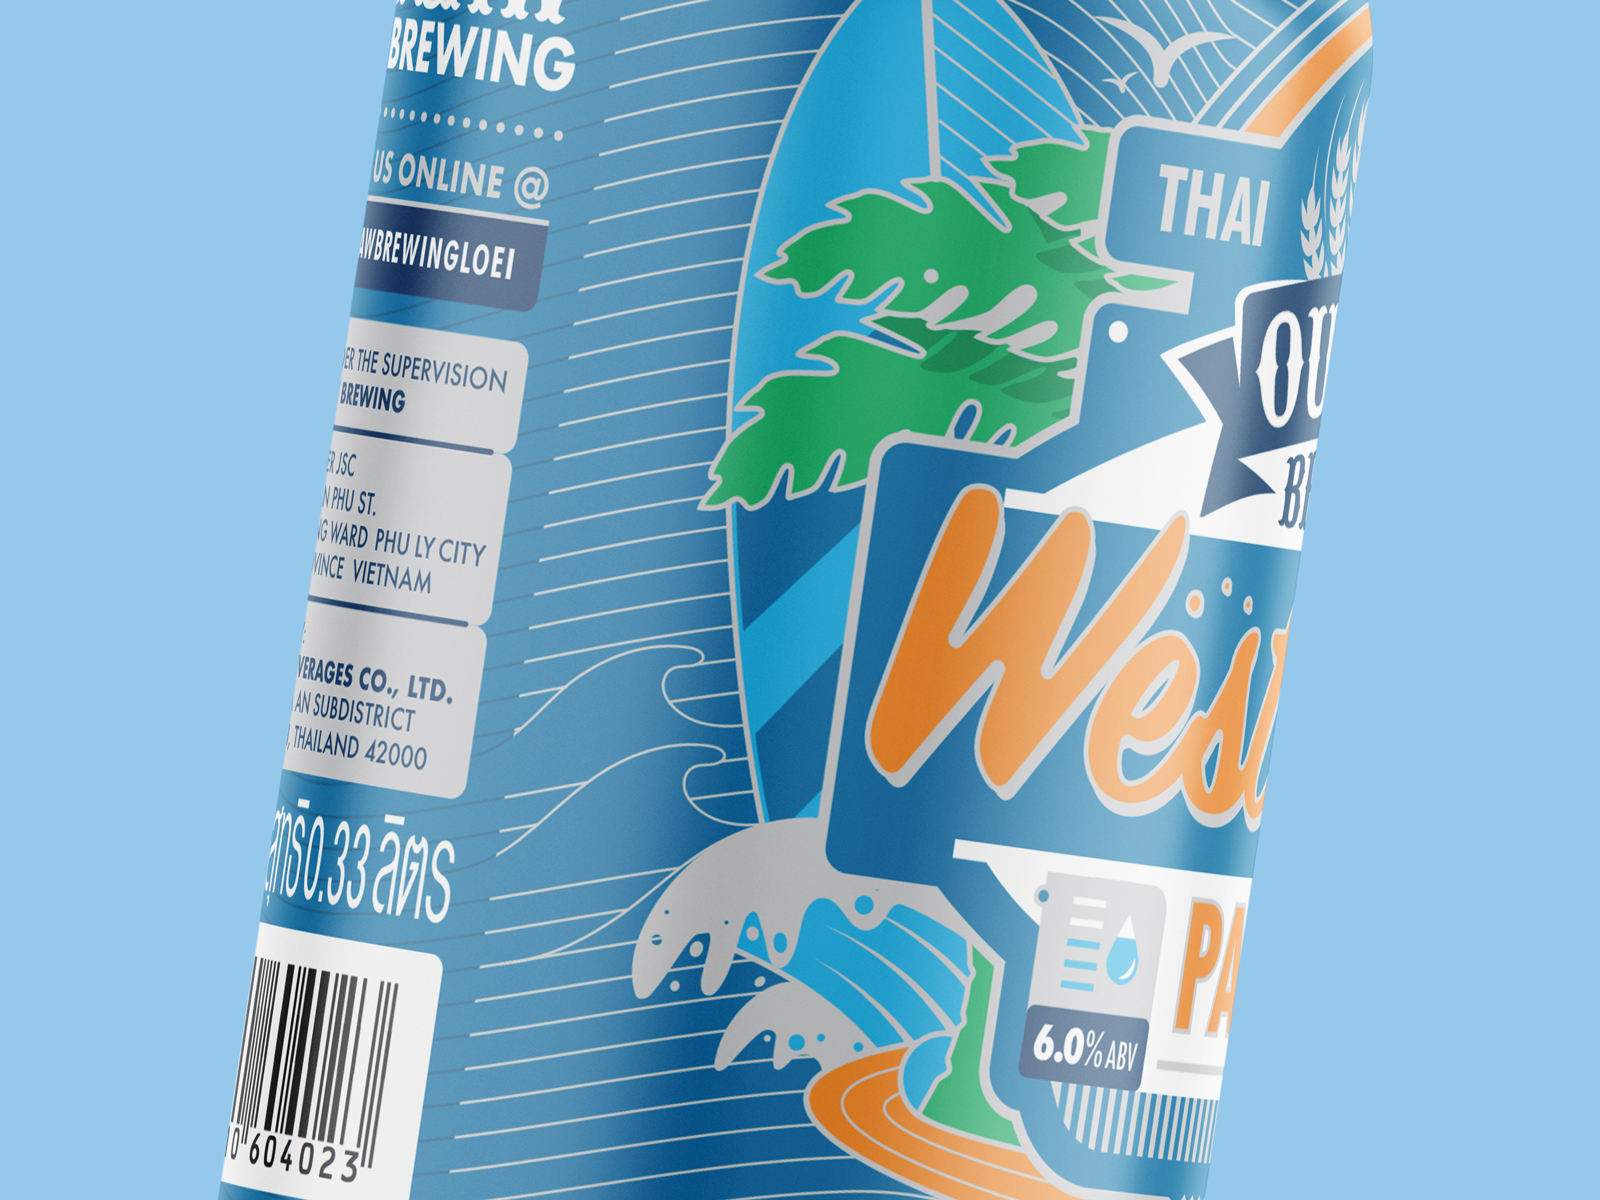 Craft beer can label design